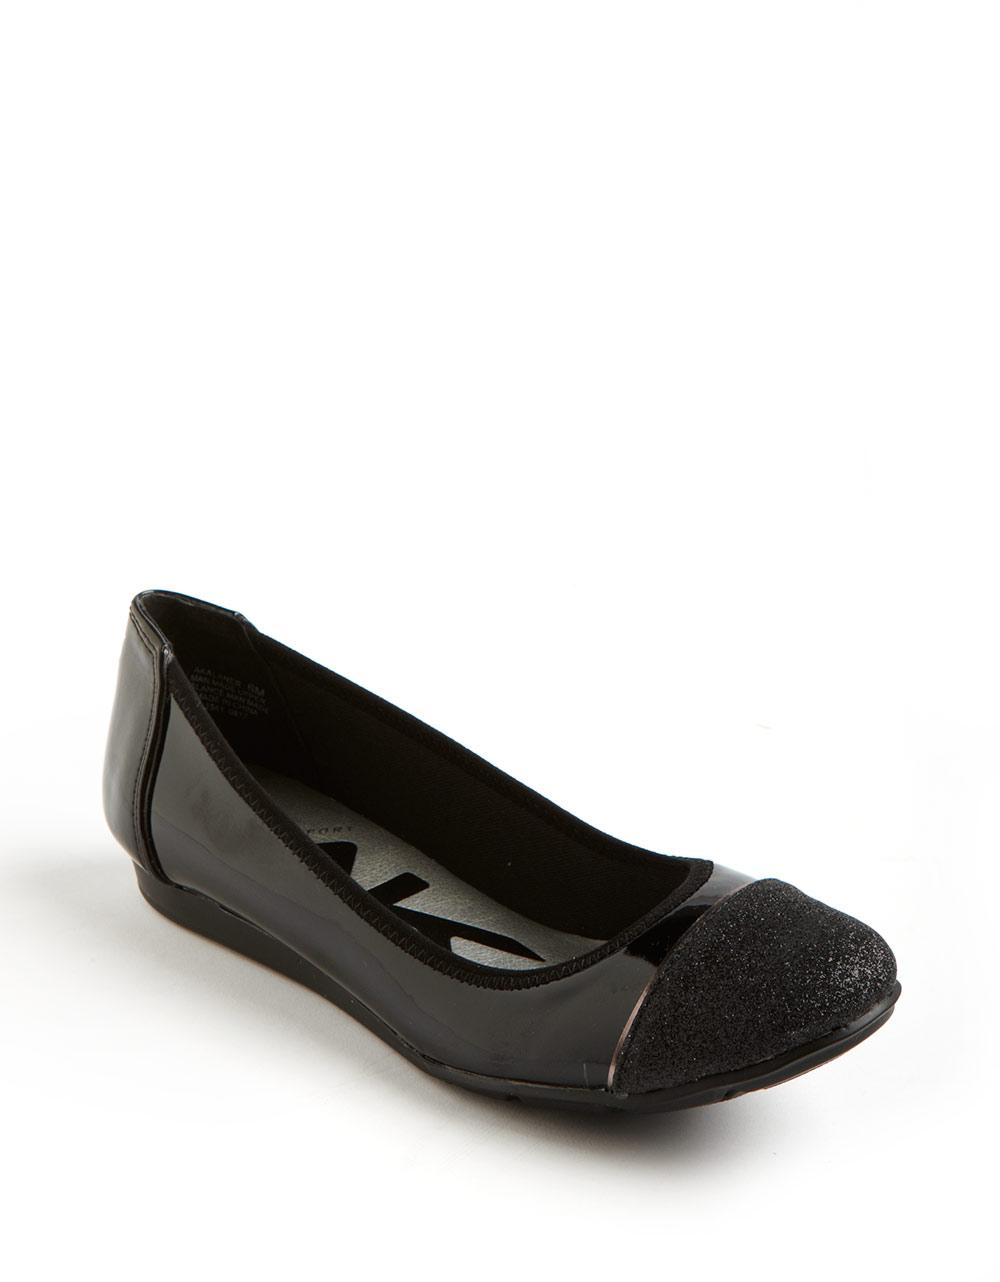 Anne Klein Alaner Glitter Captoe Flats in Black